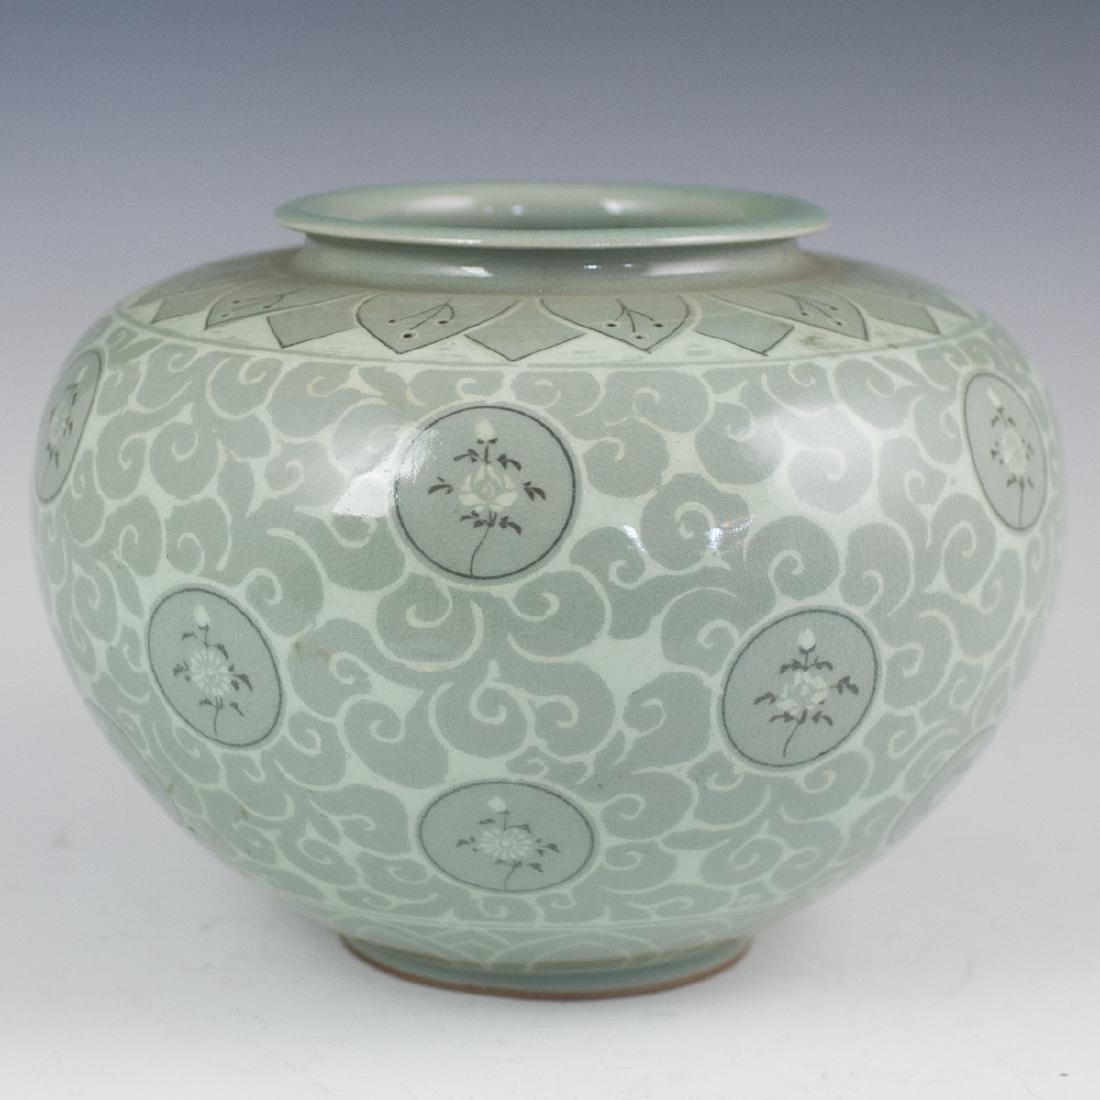 Korean Celadon Porcelain Vase